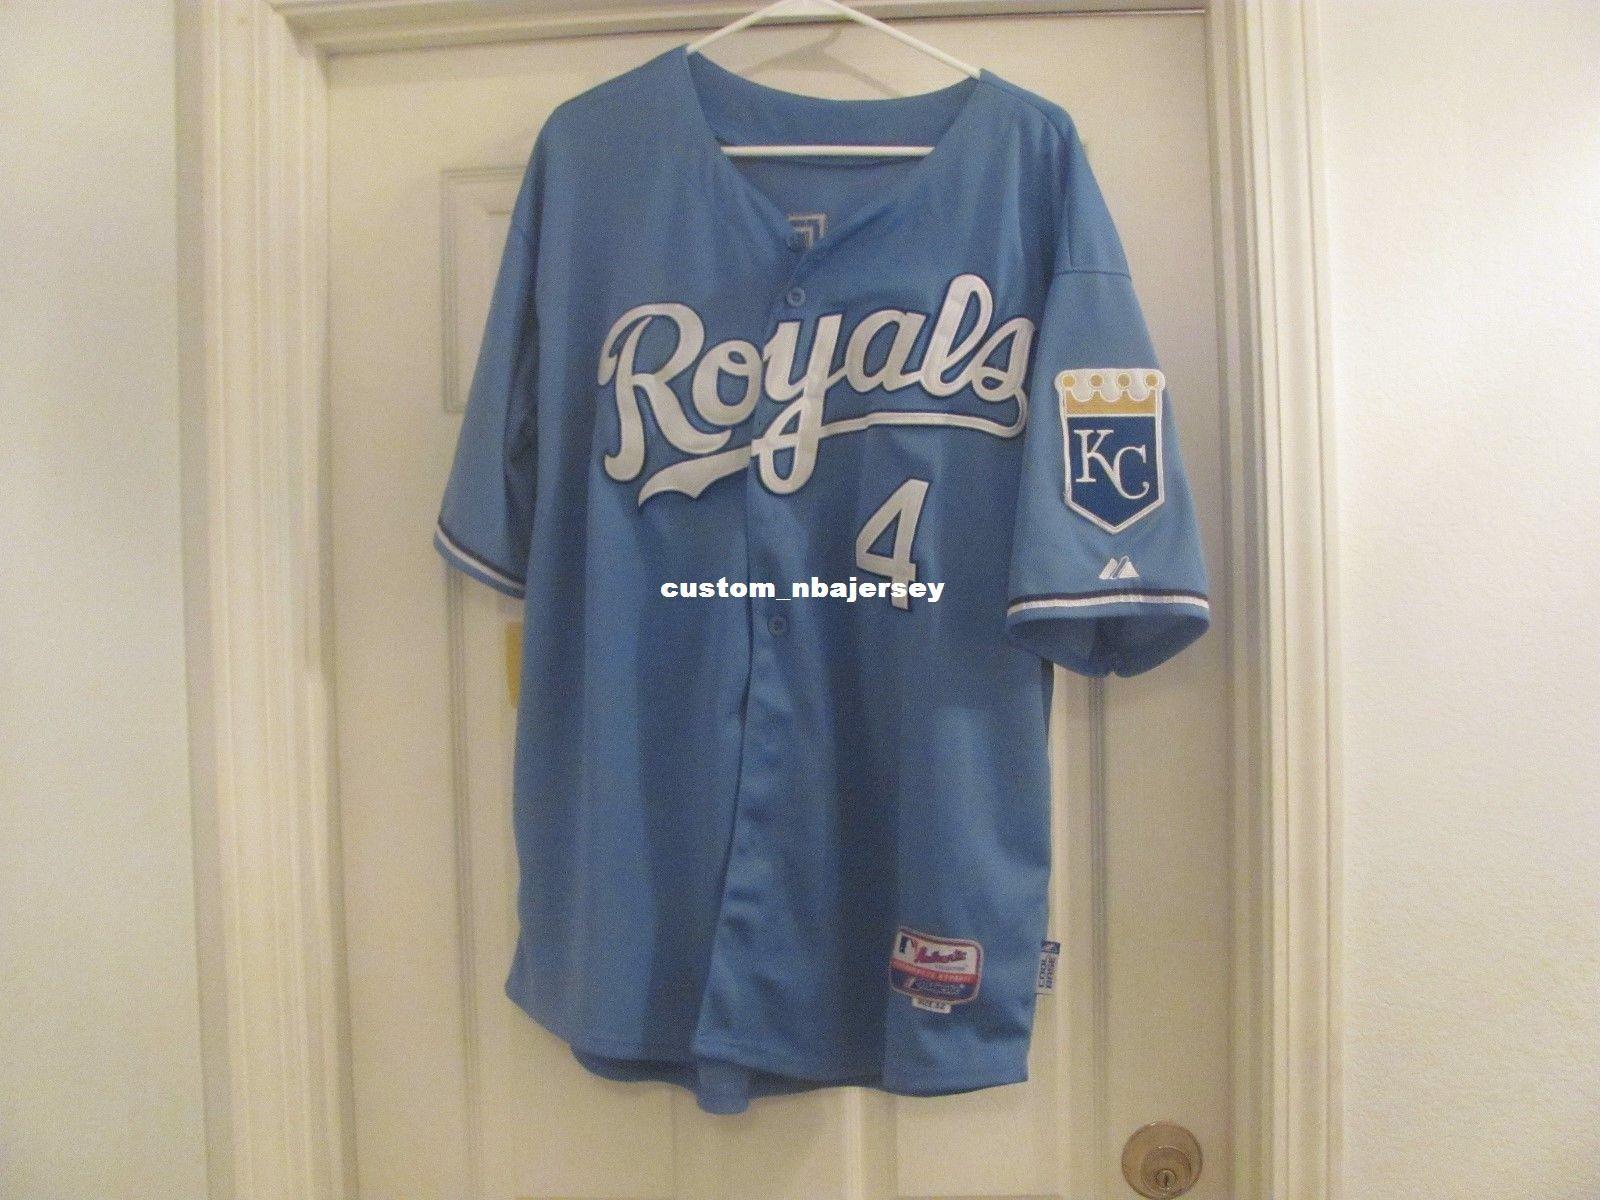 2019 Cheap Custom ALEX GORDON COOL BASE POWDER BLUE Jerseys Stitched Retro  Mens Jerseys Customize Any Name Number XS 5XL From Custom nbajersey 2a482124264